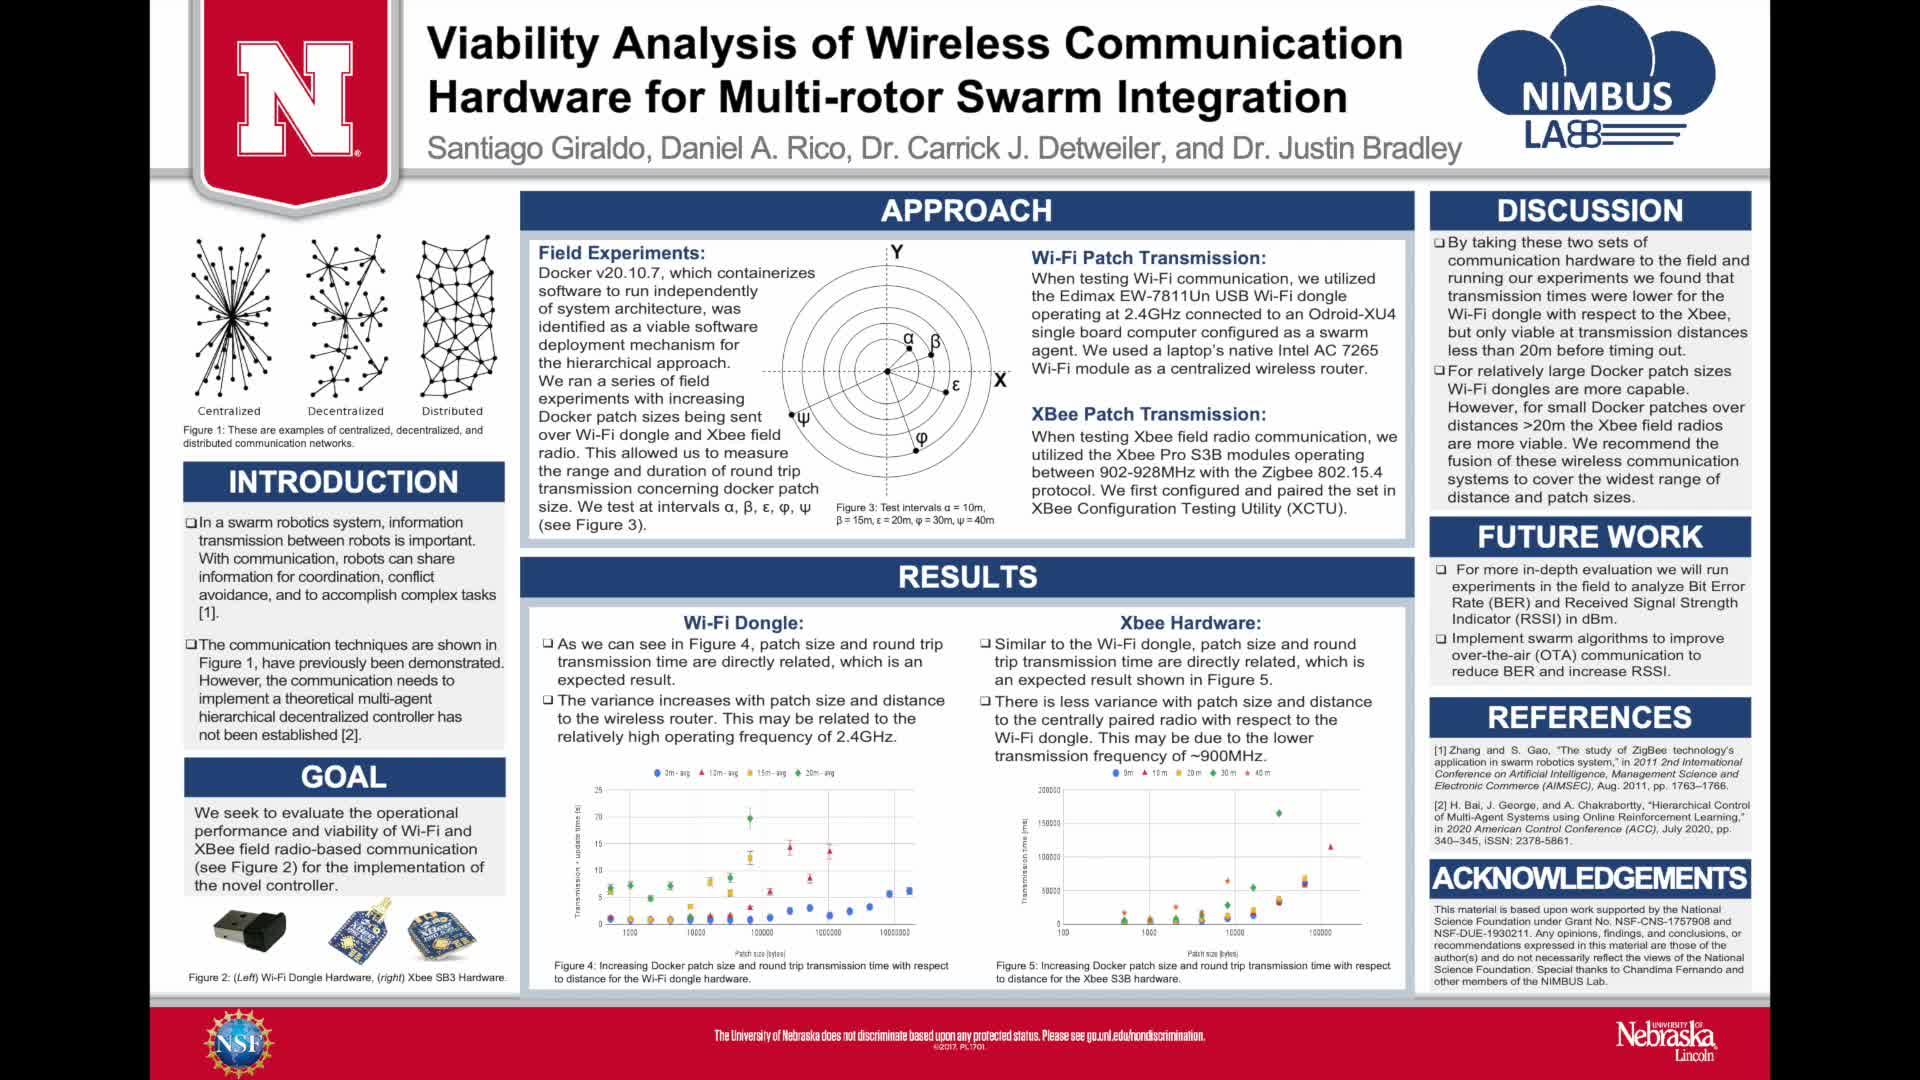 Viability Analysis of Wireless Communication Hardware for Multi-rotor Swarm Integration